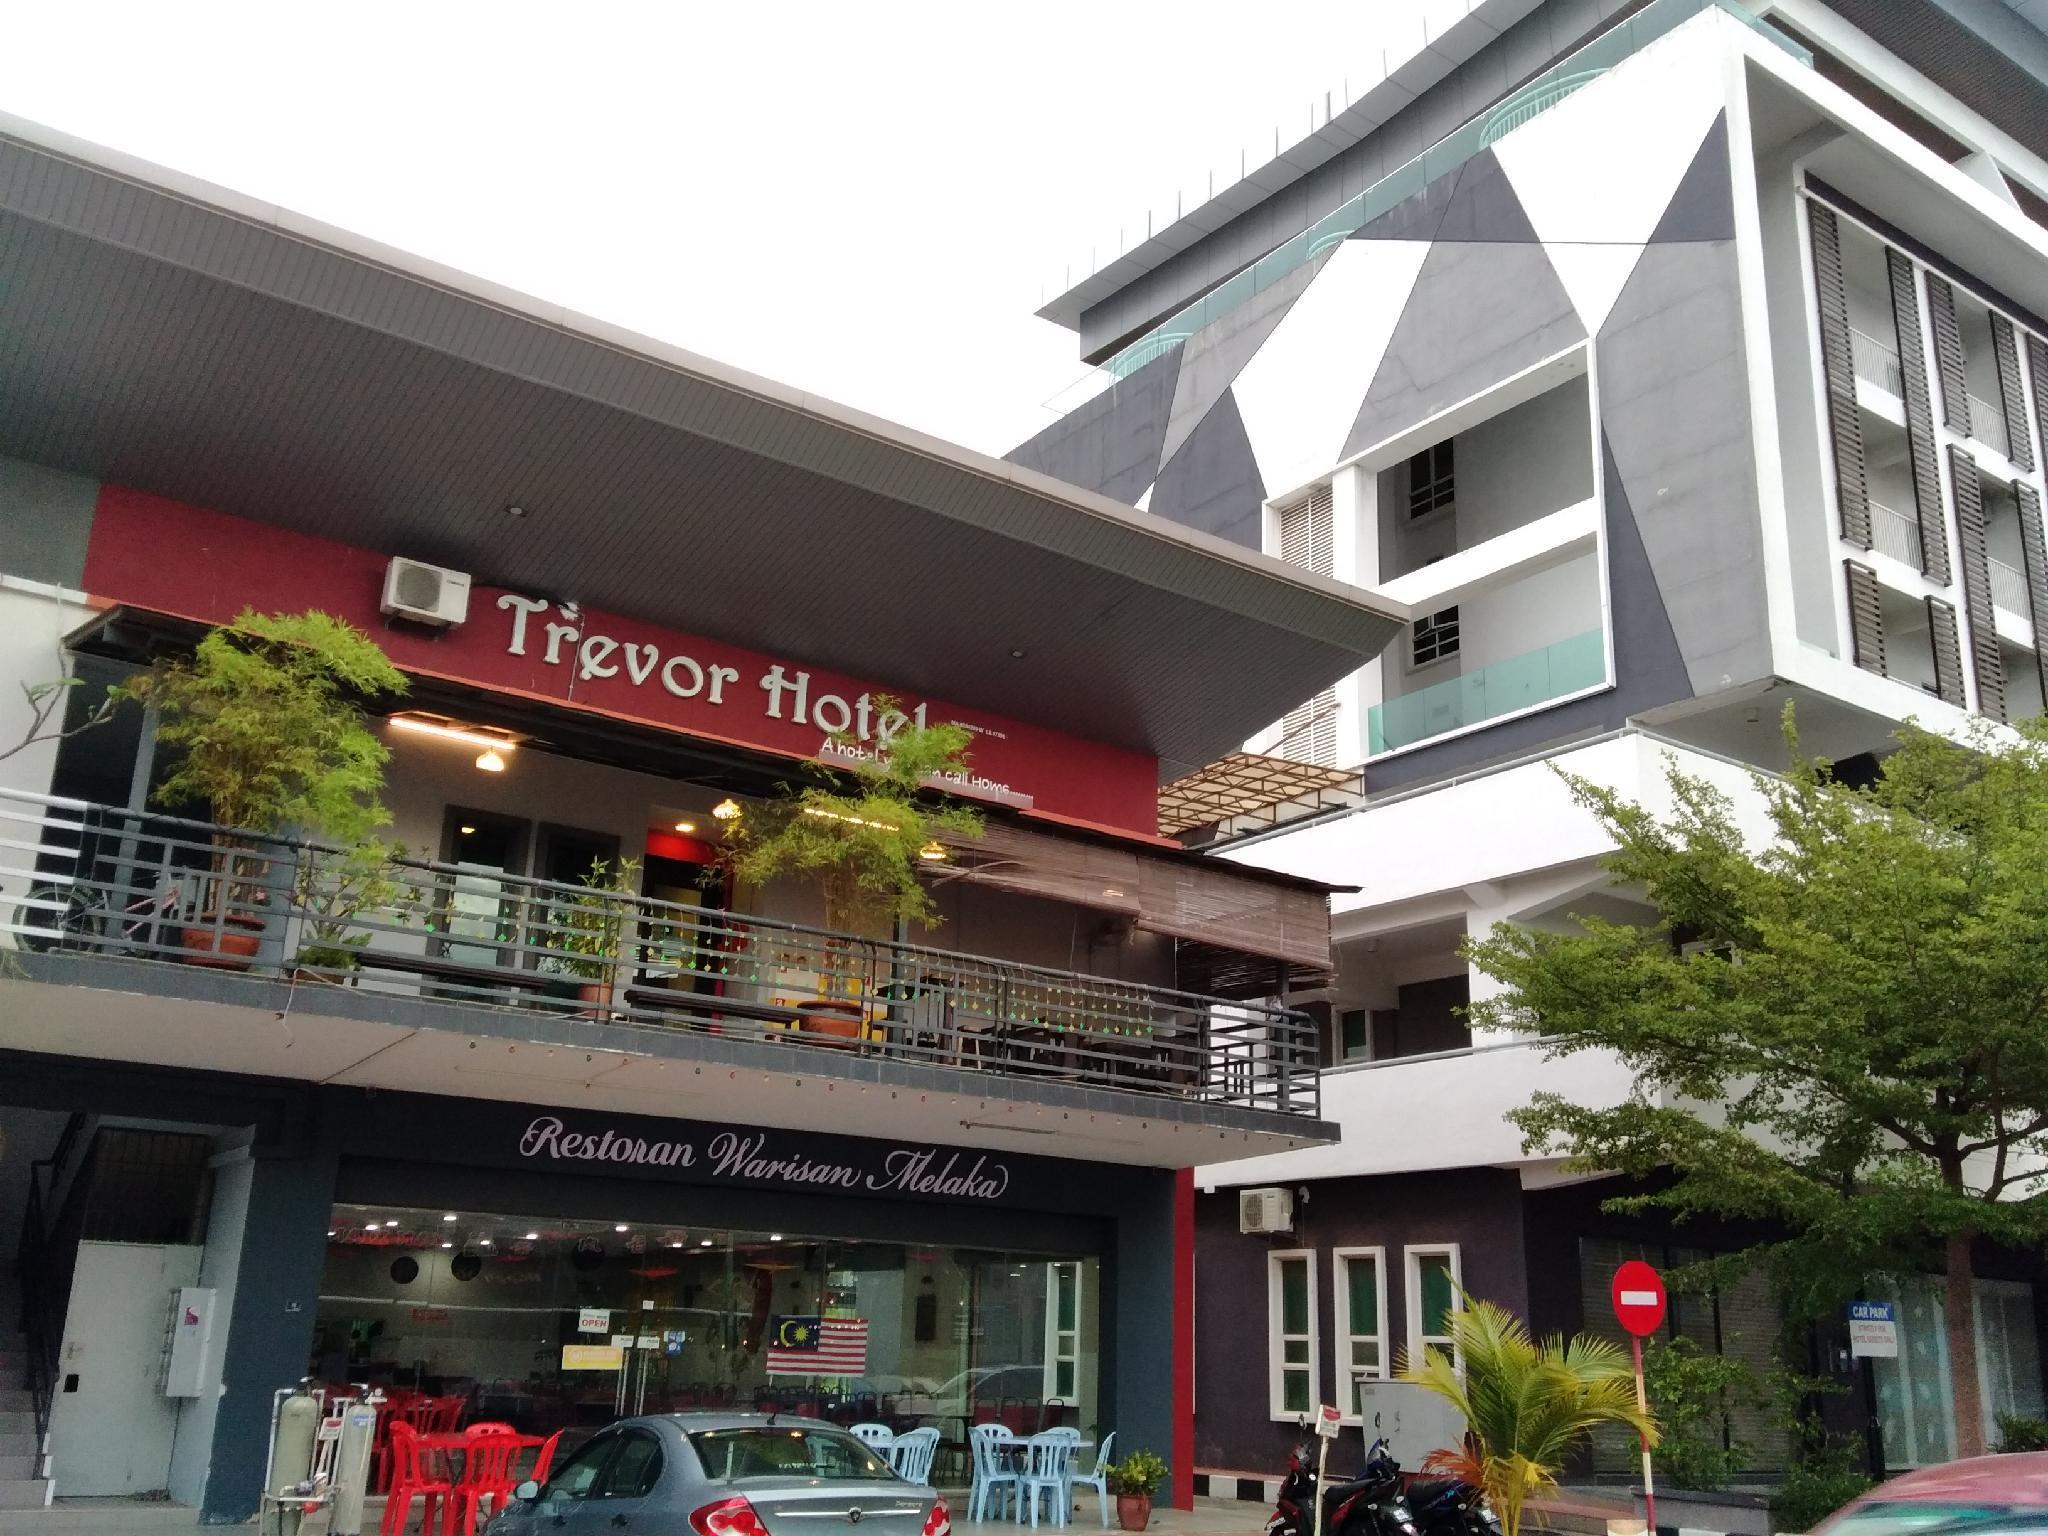 Trevor Hotel